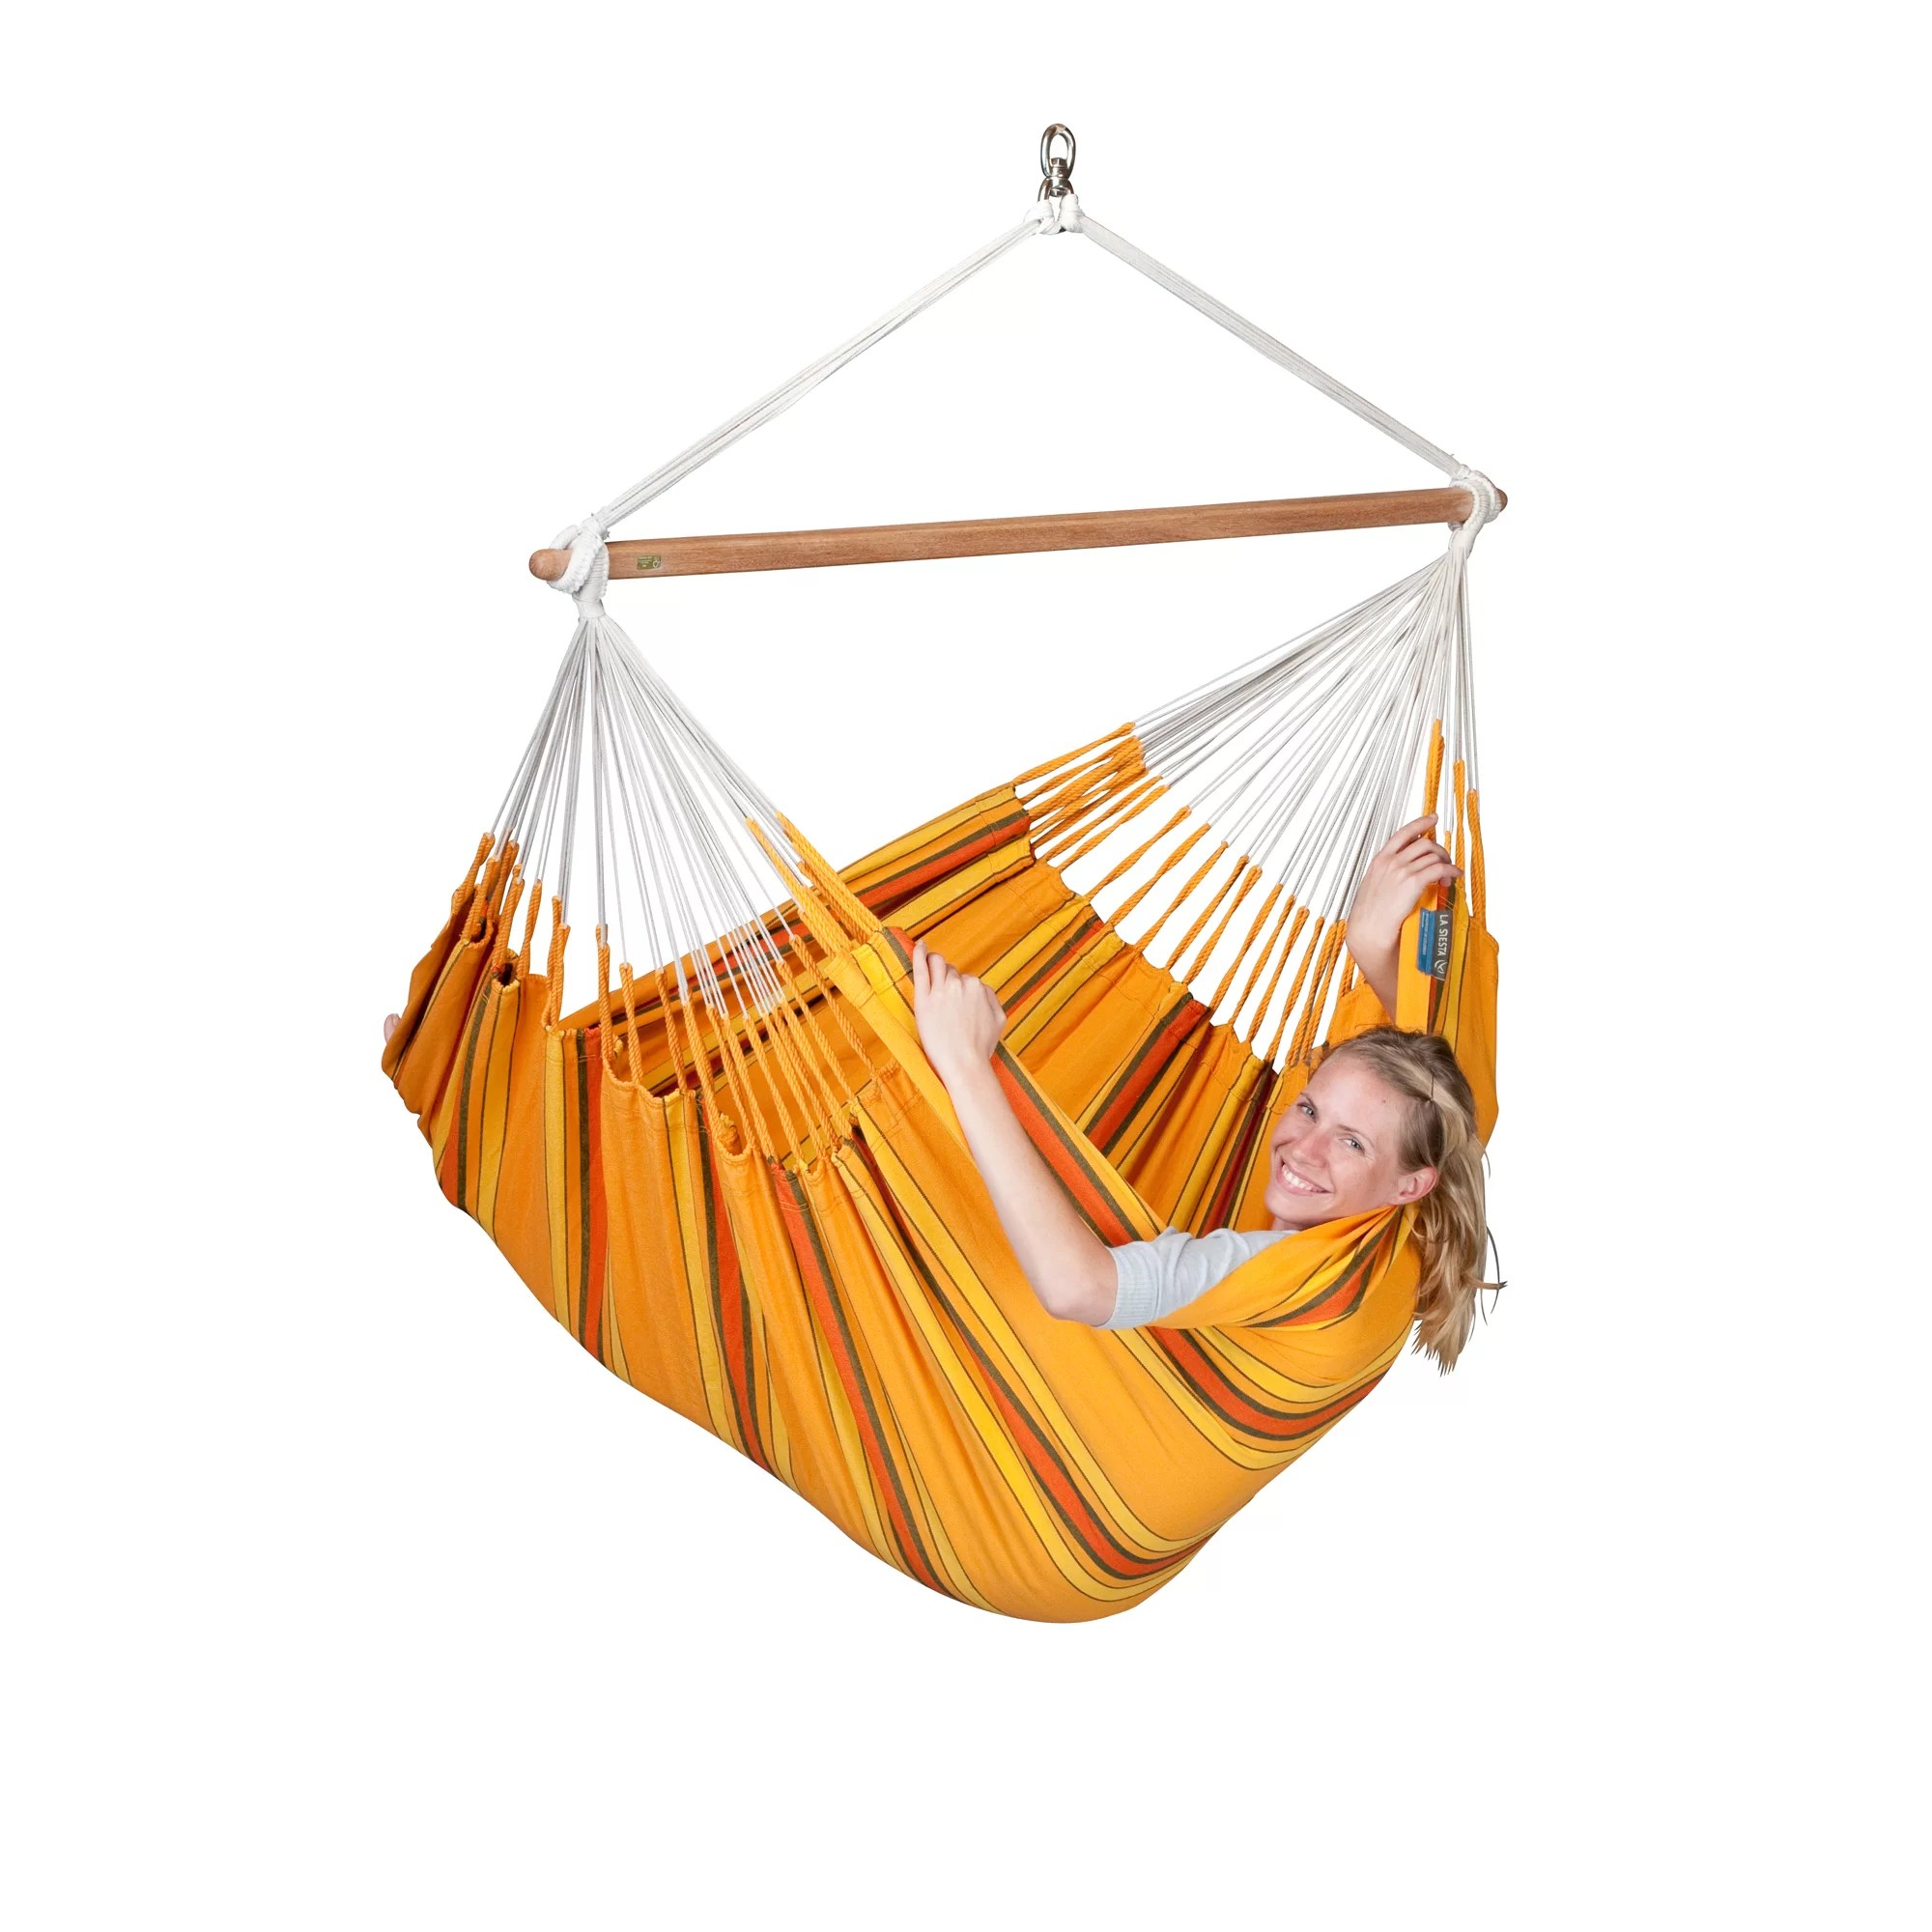 la siesta hammock chair office arm pads currambera lounger wayfair